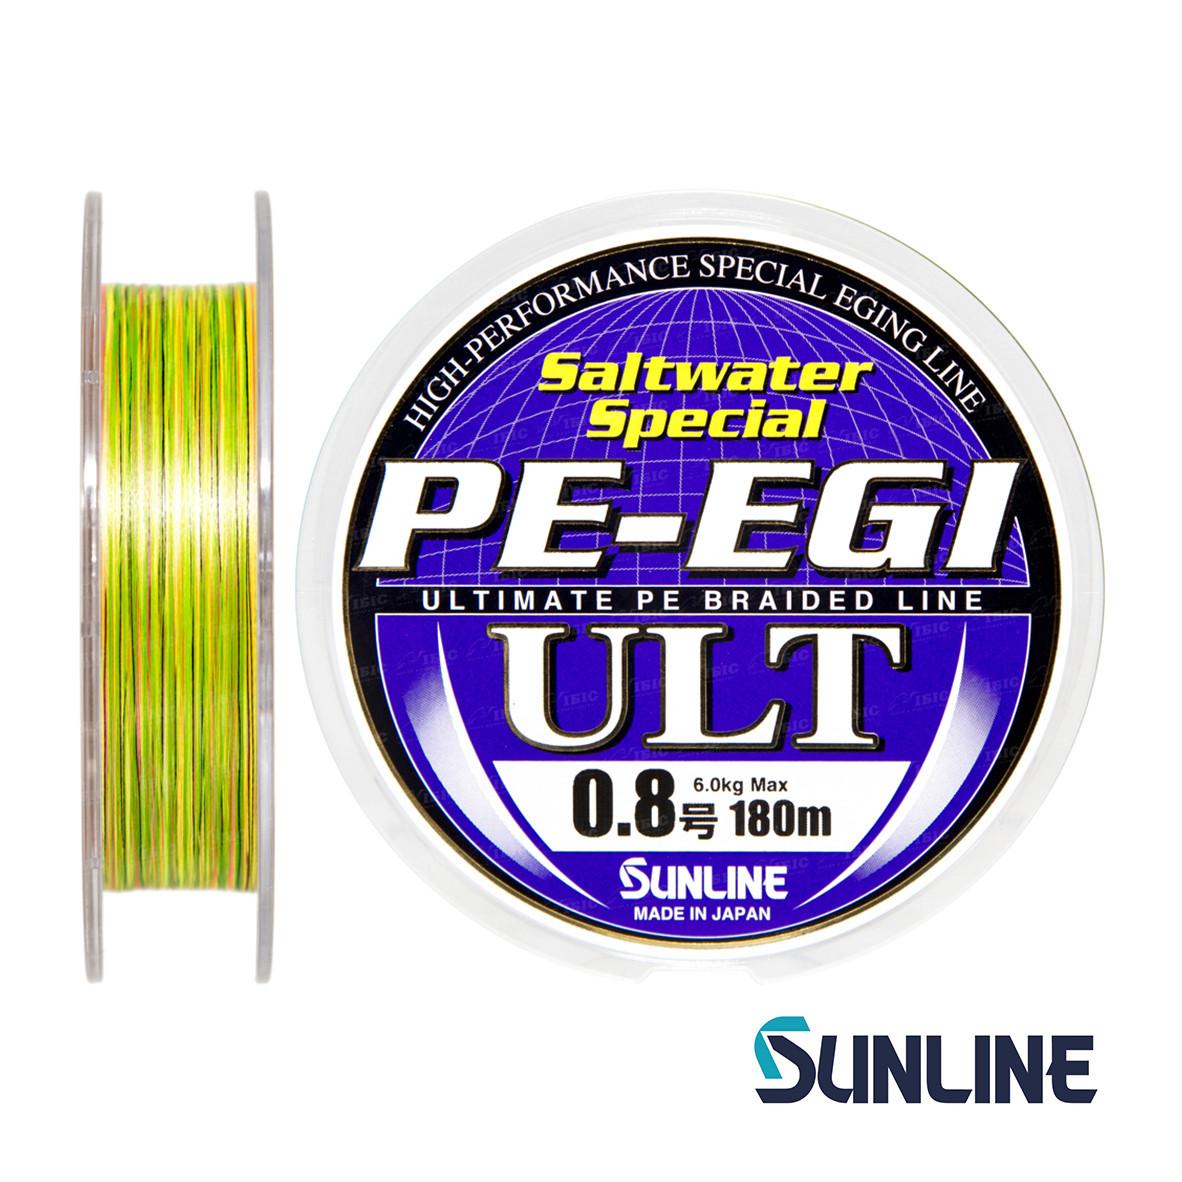 Шнур Sunline PE-EGI ULT 240m #0.4/0.104мм 3.3кг